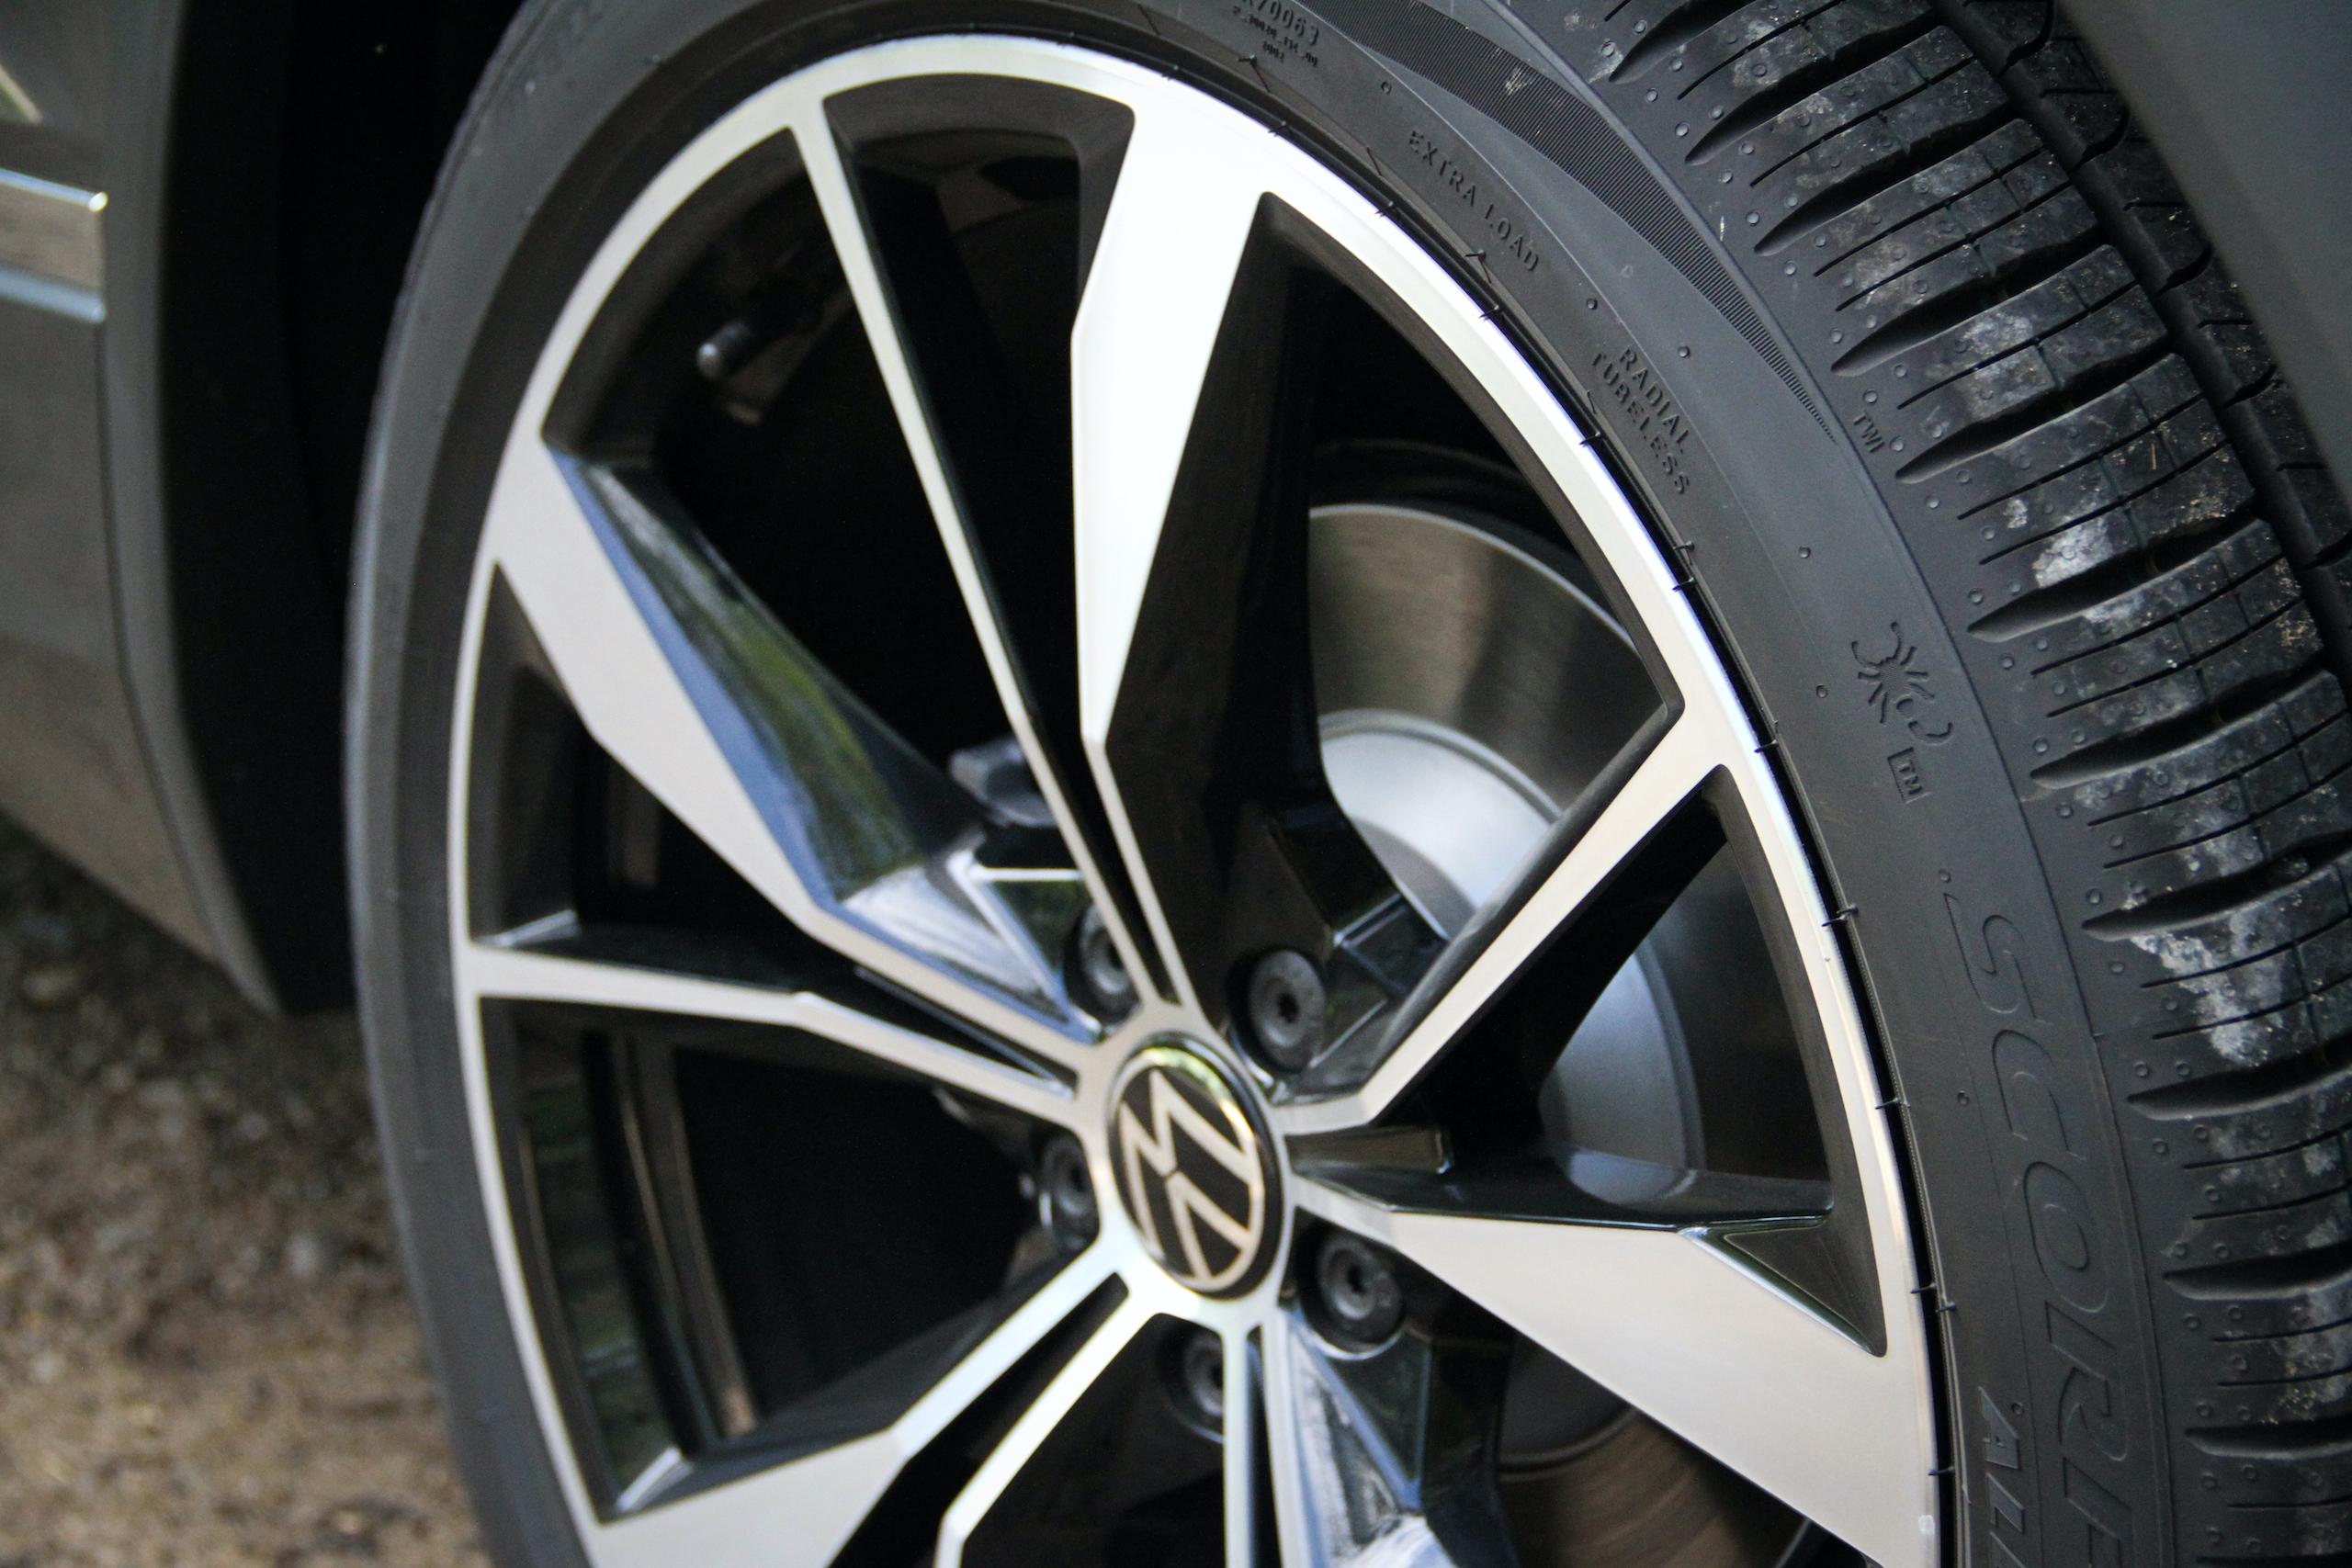 2022 VW Tiguan SEL R-Line wheel close